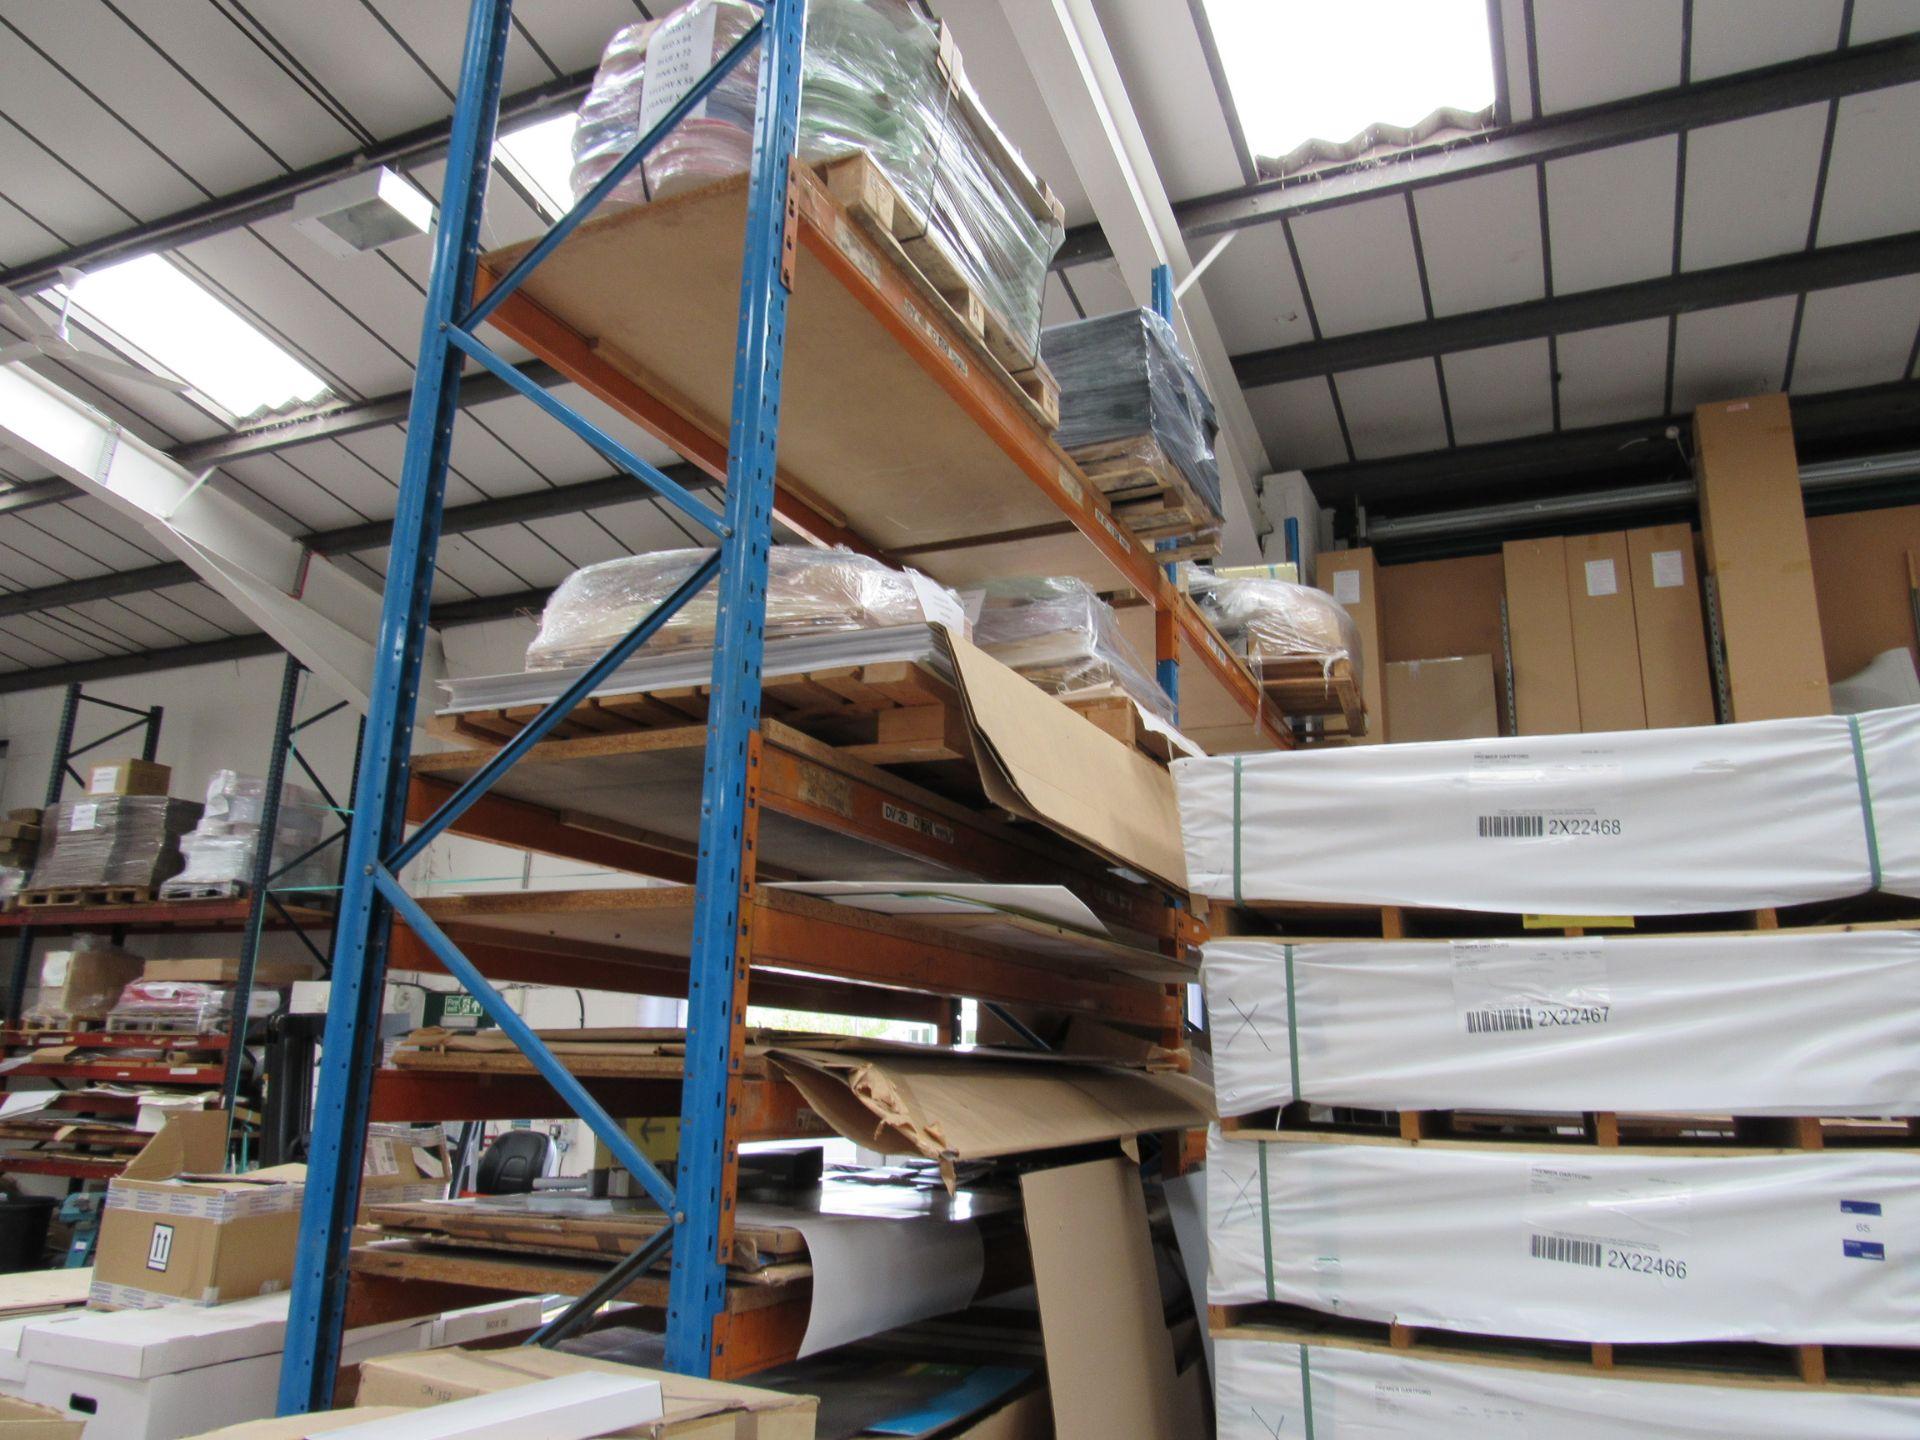 2 Bays Warehouse Racking, 3 End Frames, 22 Cross Beams - Image 3 of 3